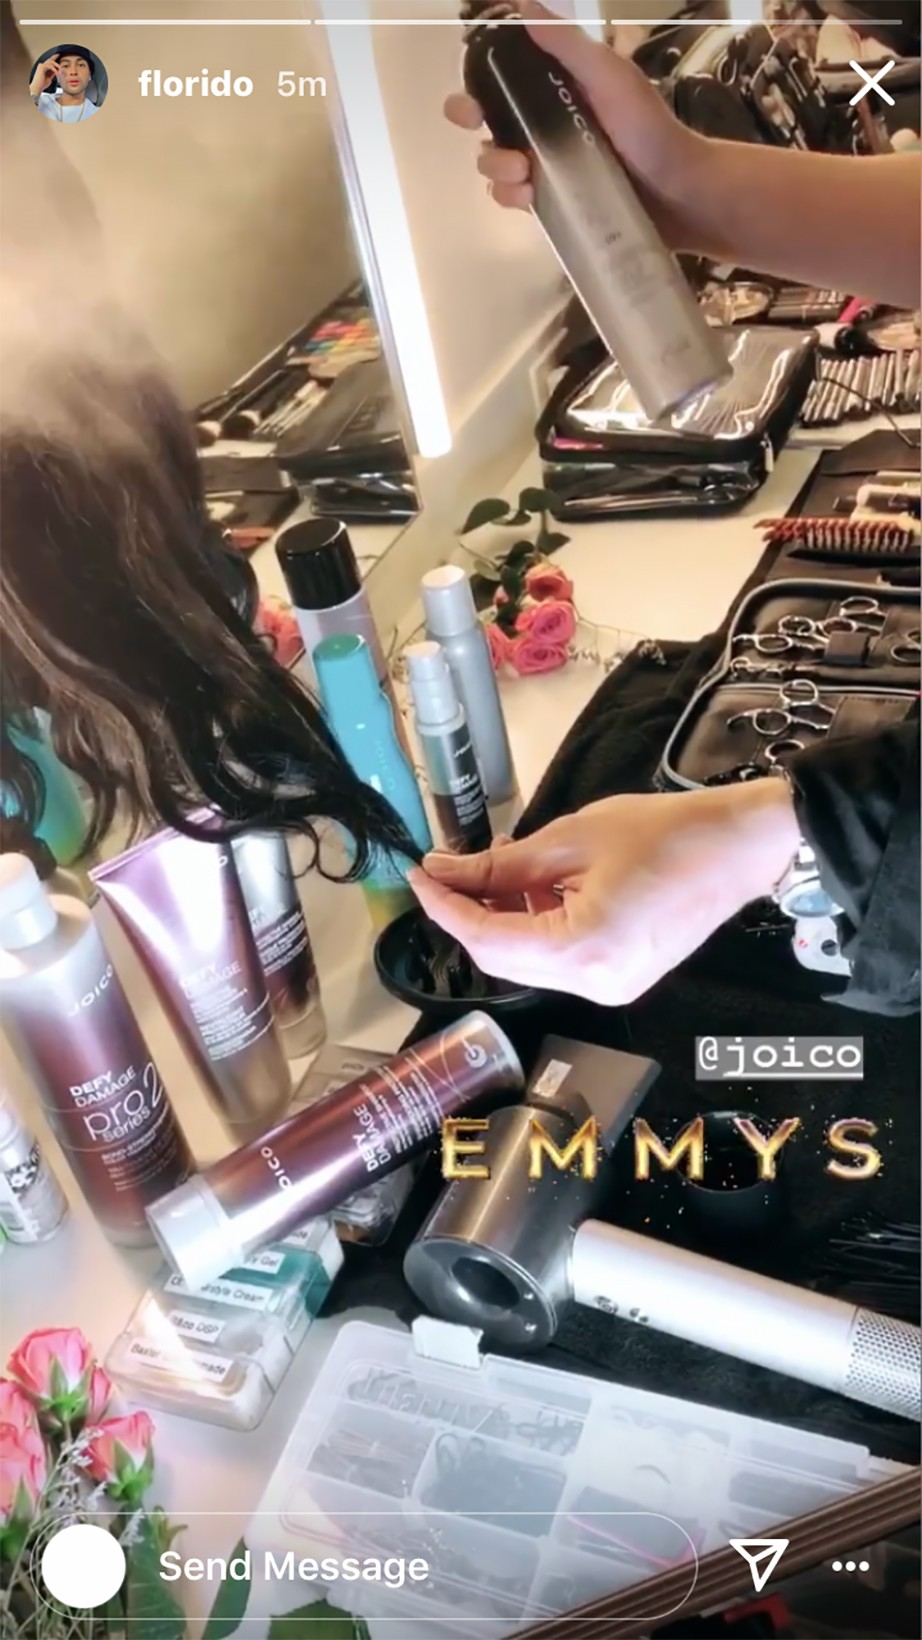 halsey 71 emmy awards florido joico celebrity hairstylist hairstyle singer beauty style